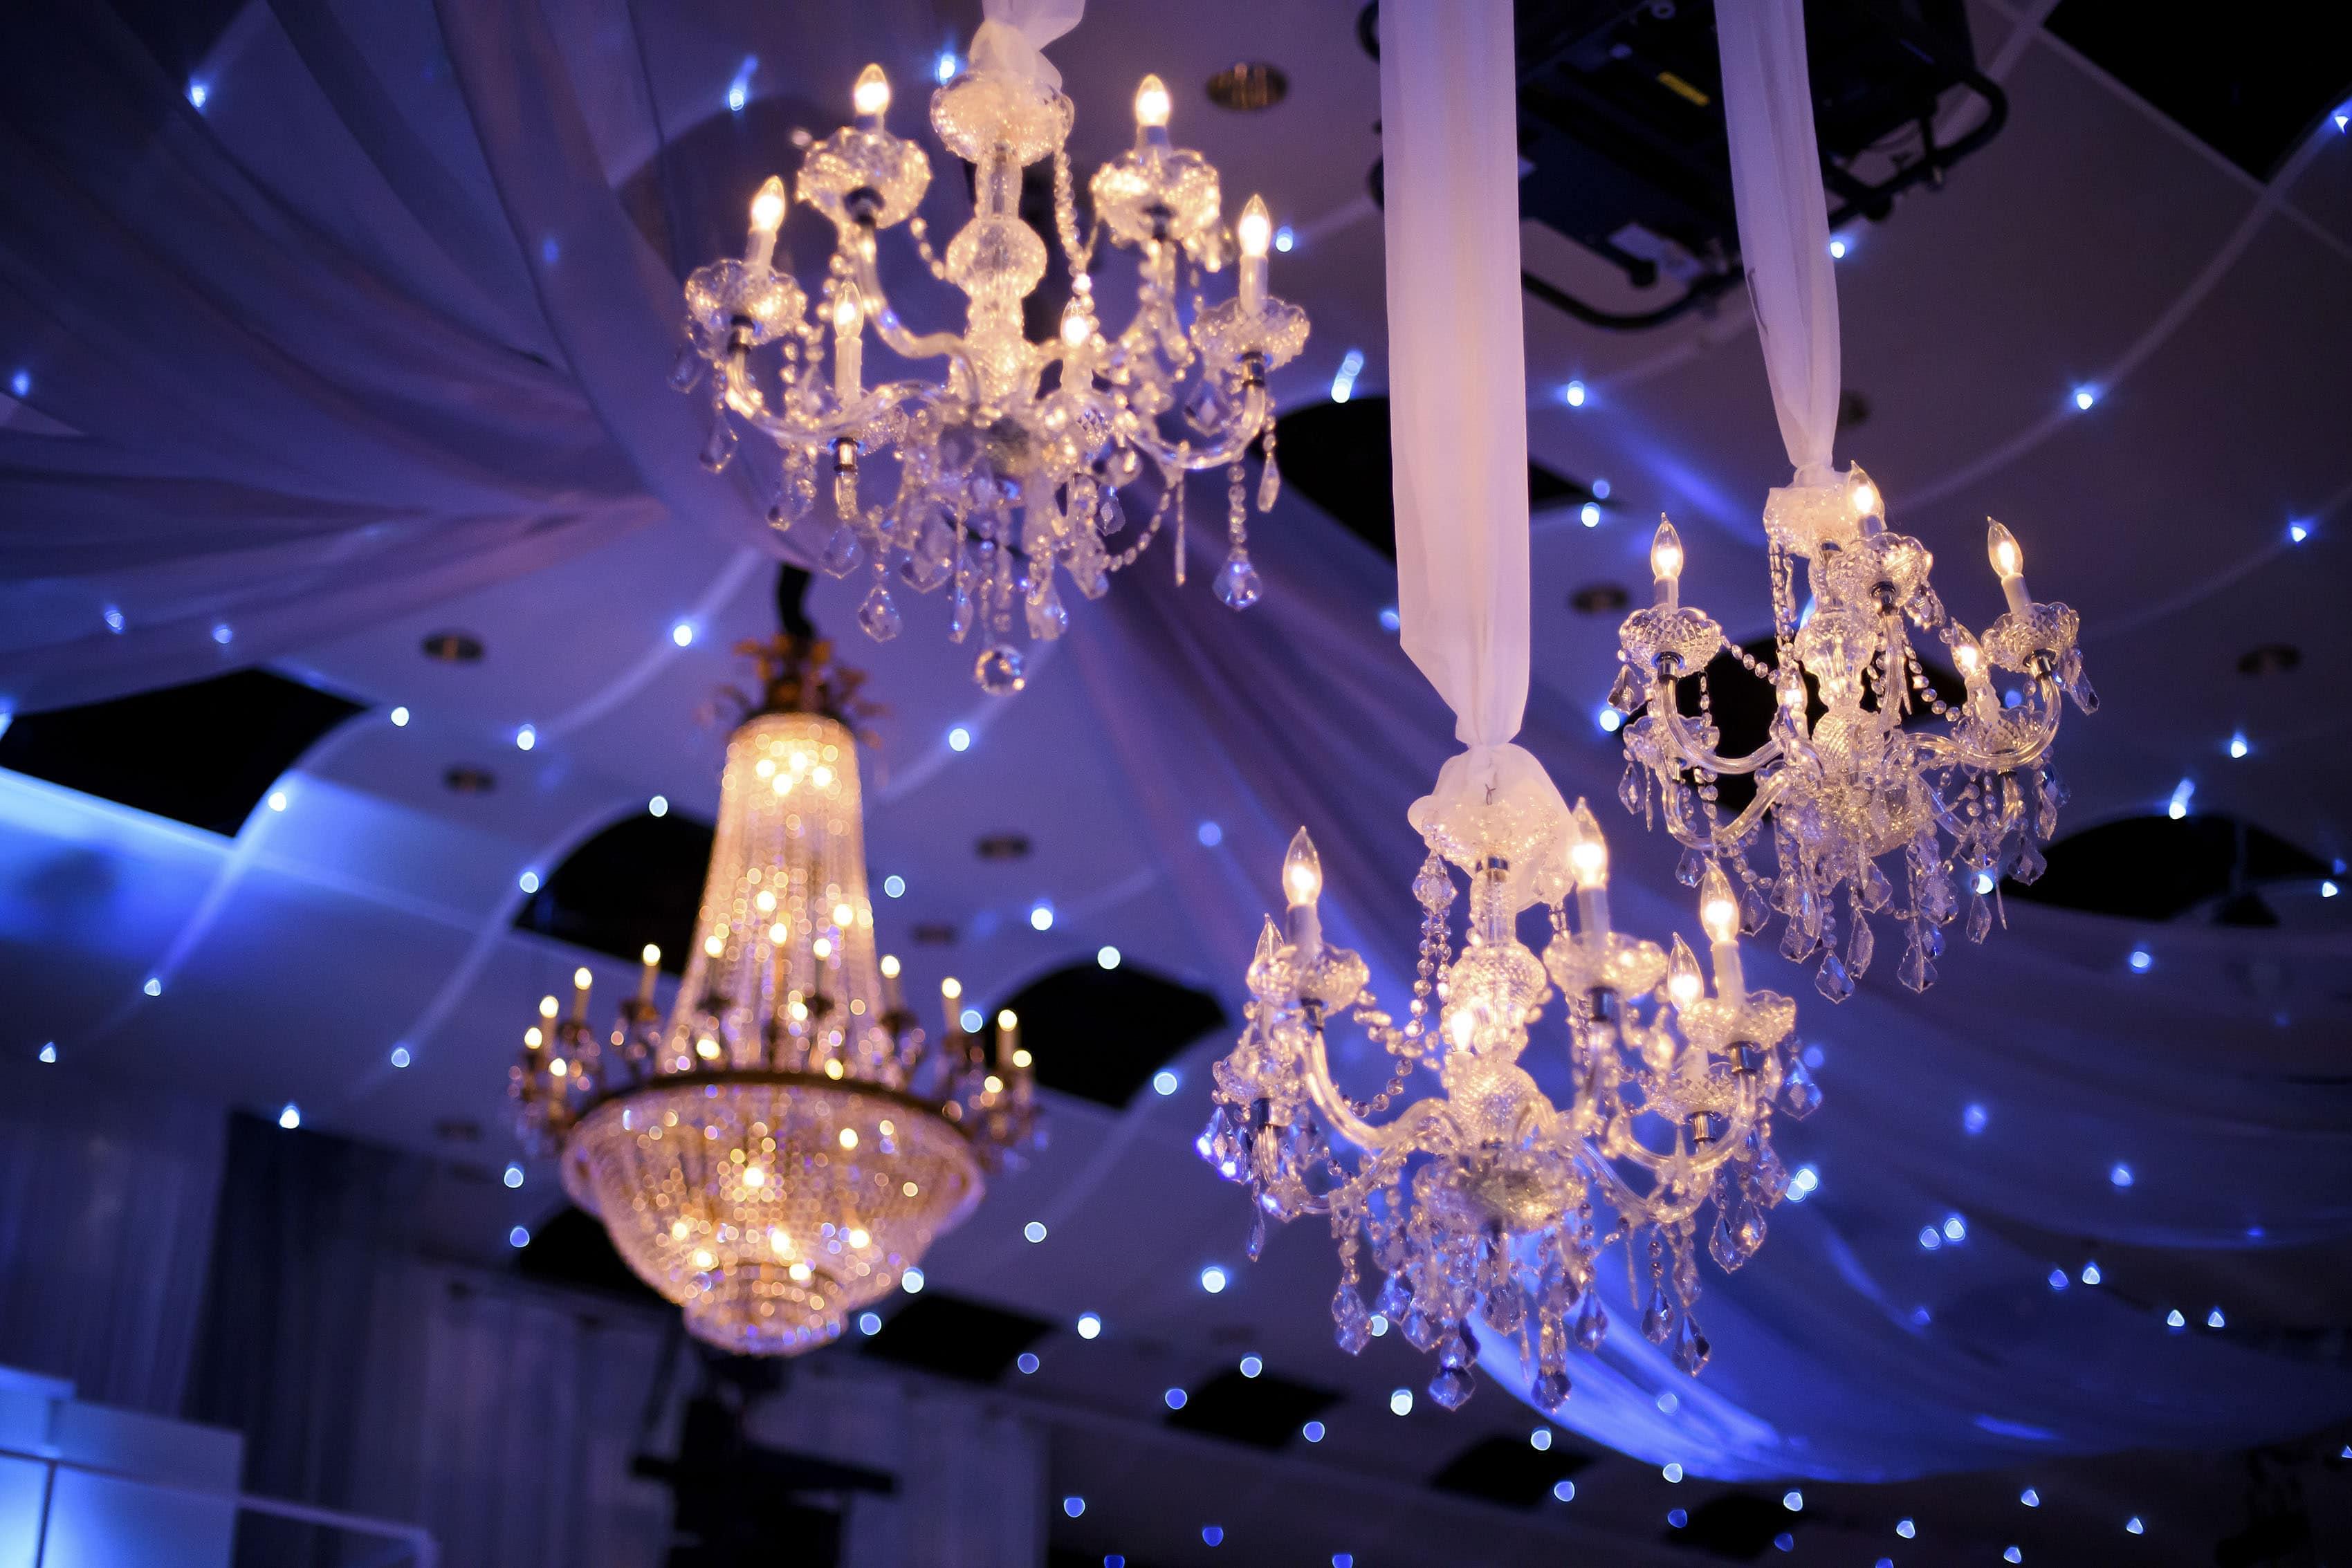 Seawell Ballroom chandeliers for a Greek wedding reception